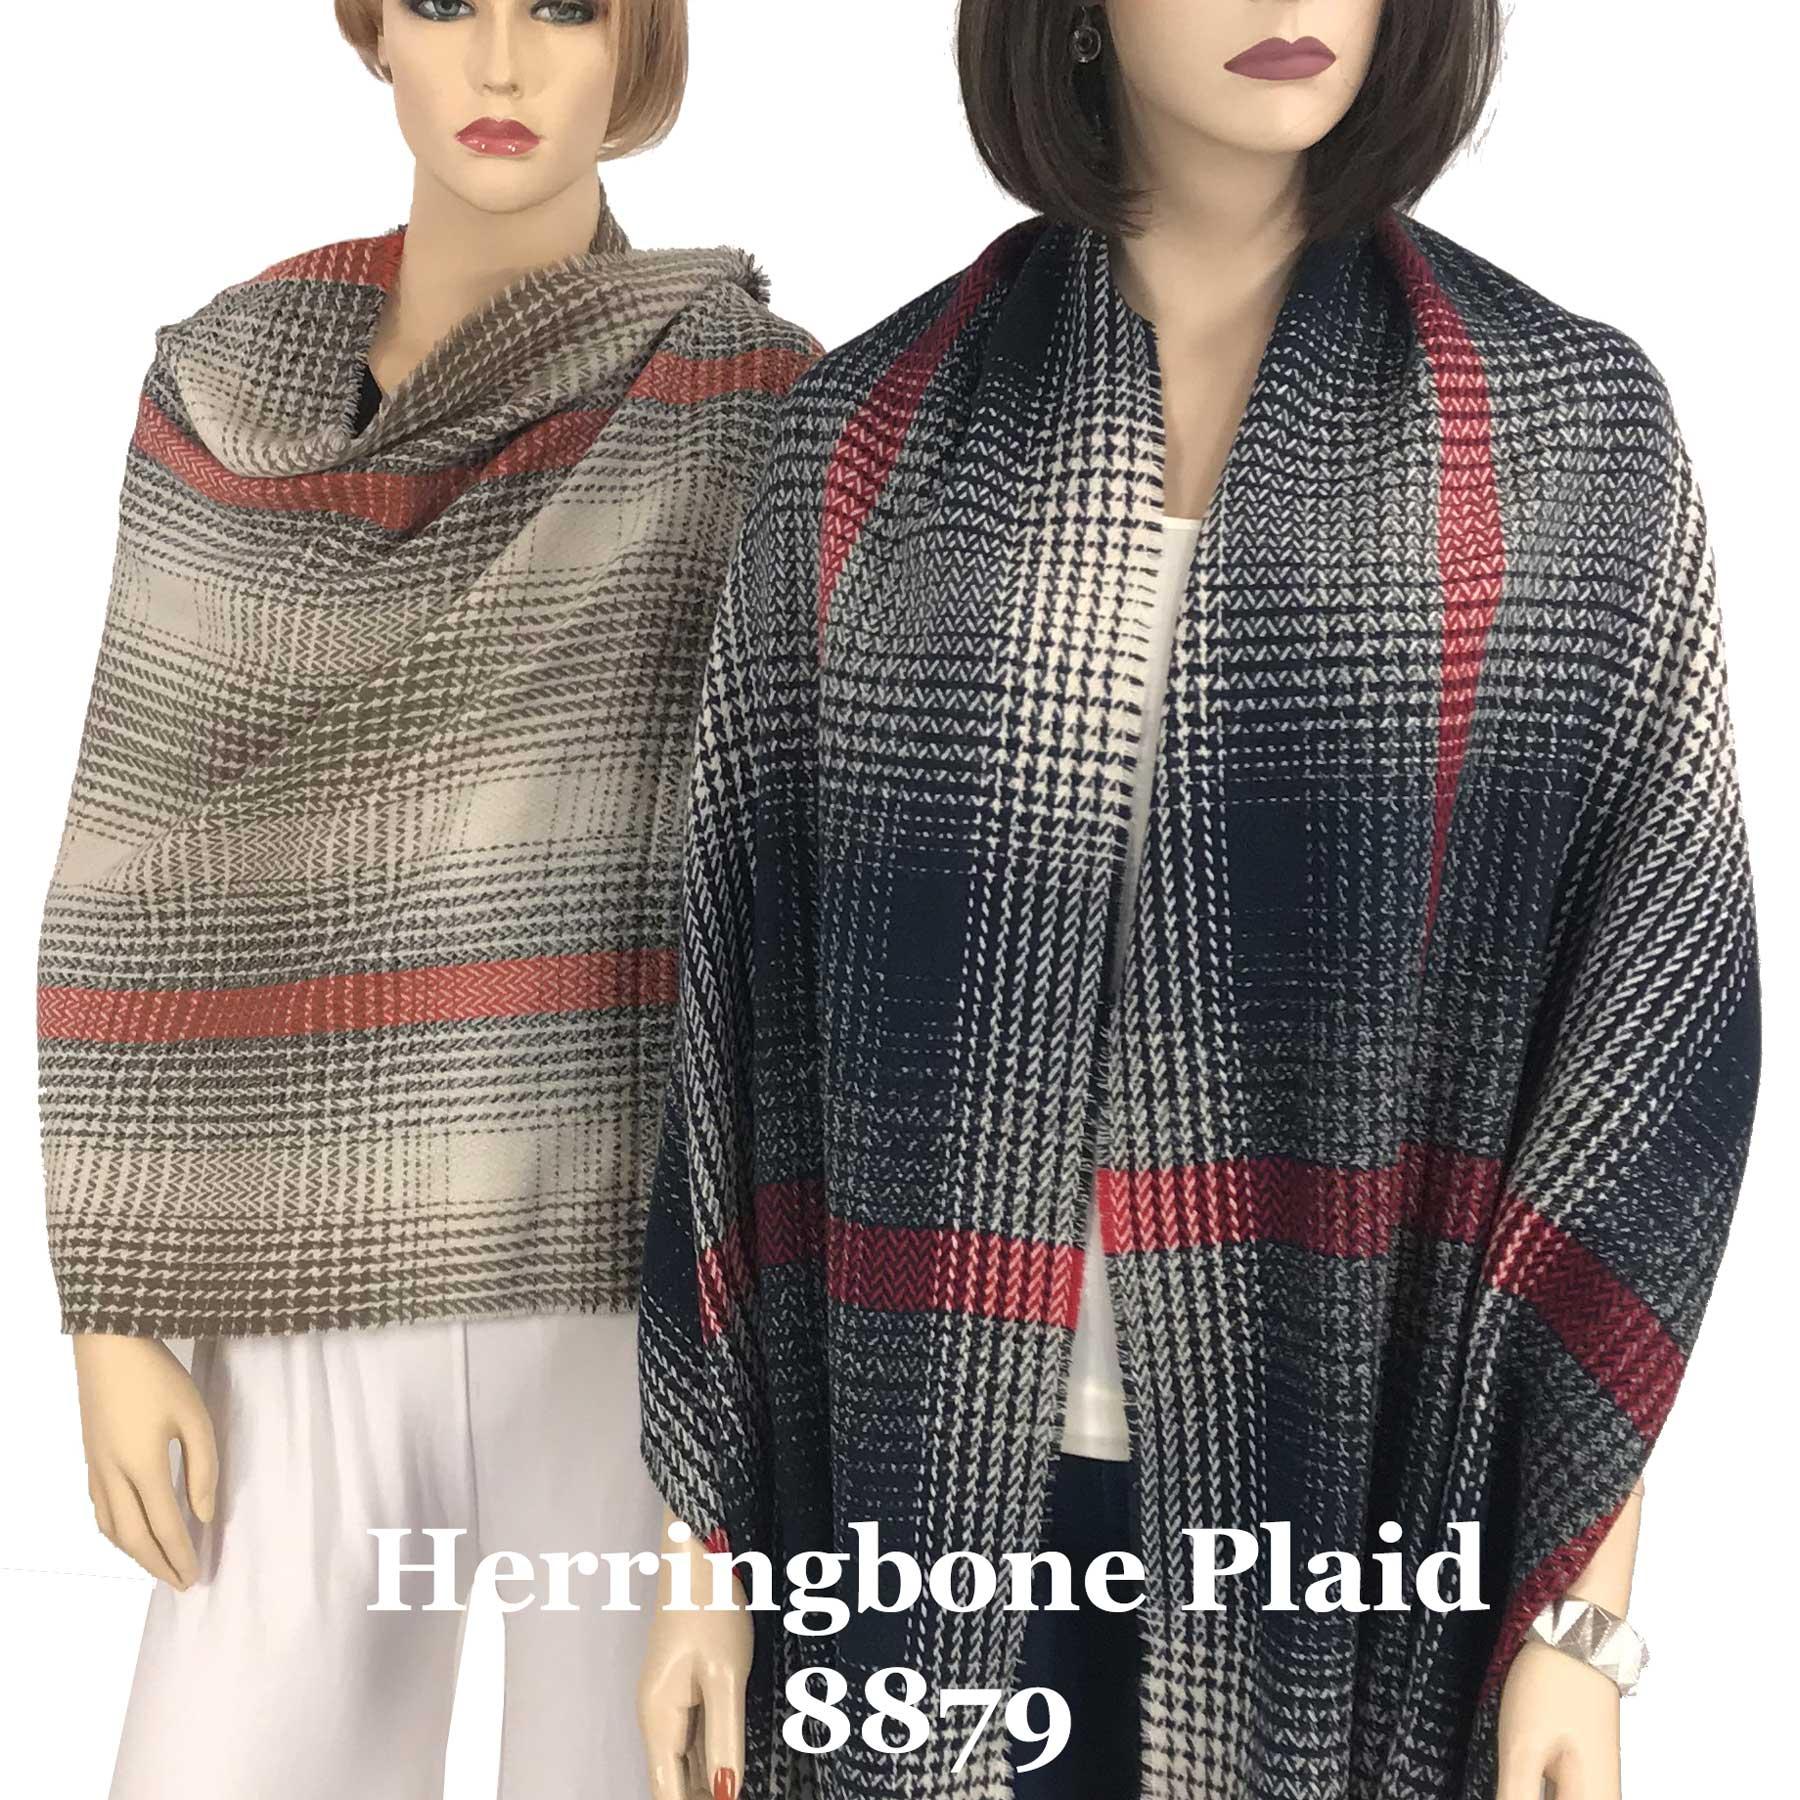 Oblong Shawls - Herringbone Ombre 8879